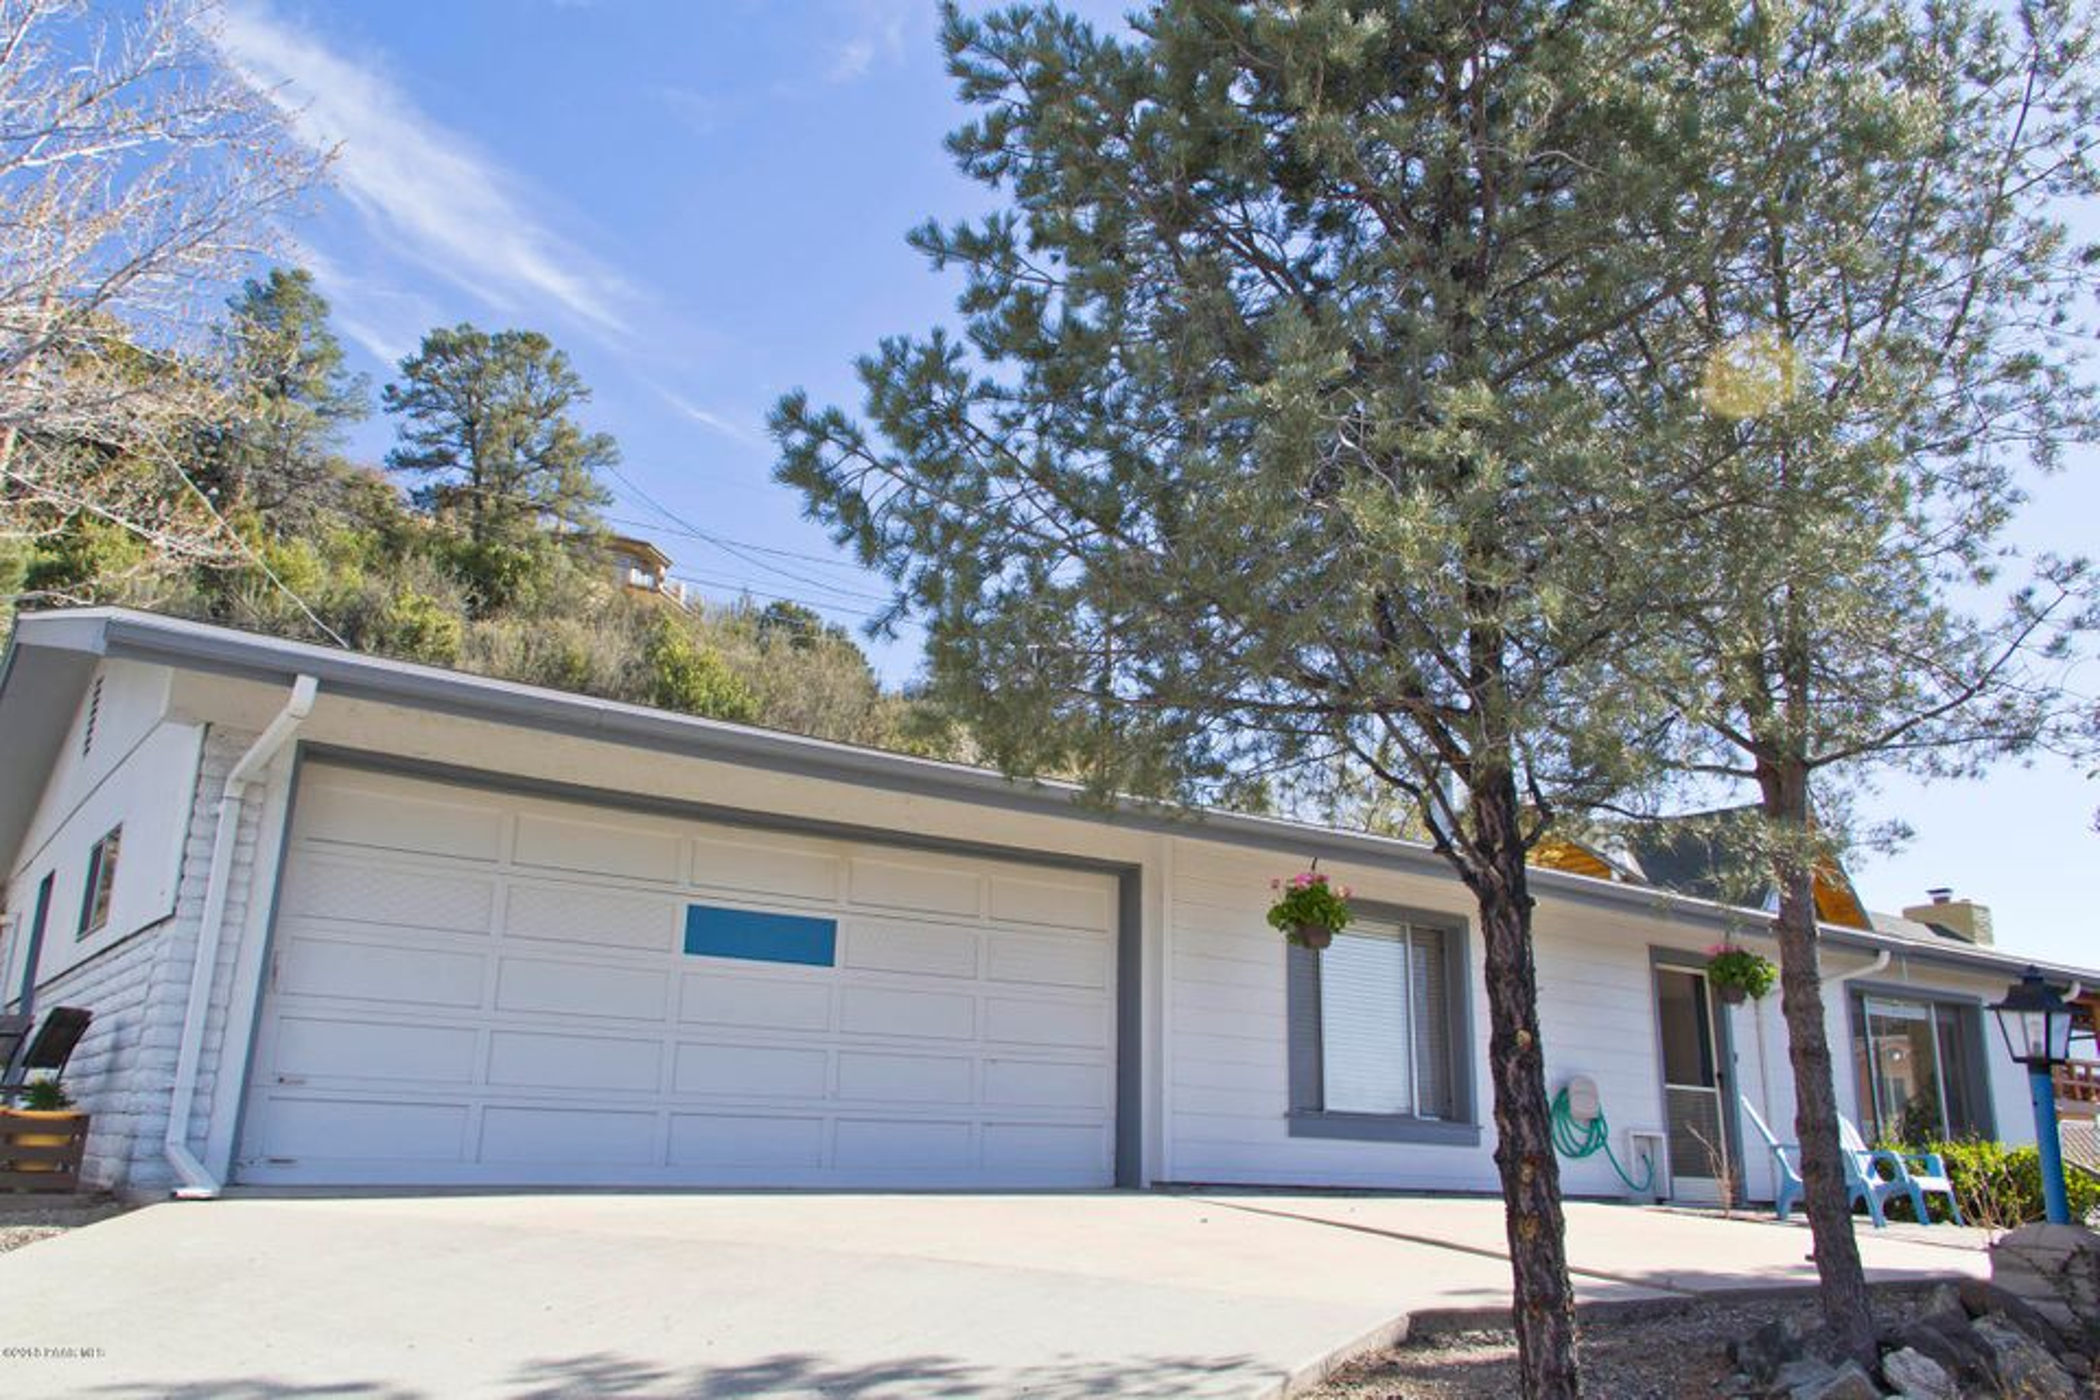 575 S Skyview Drive Prescott, AZ 86303 - MLS #: 1010786